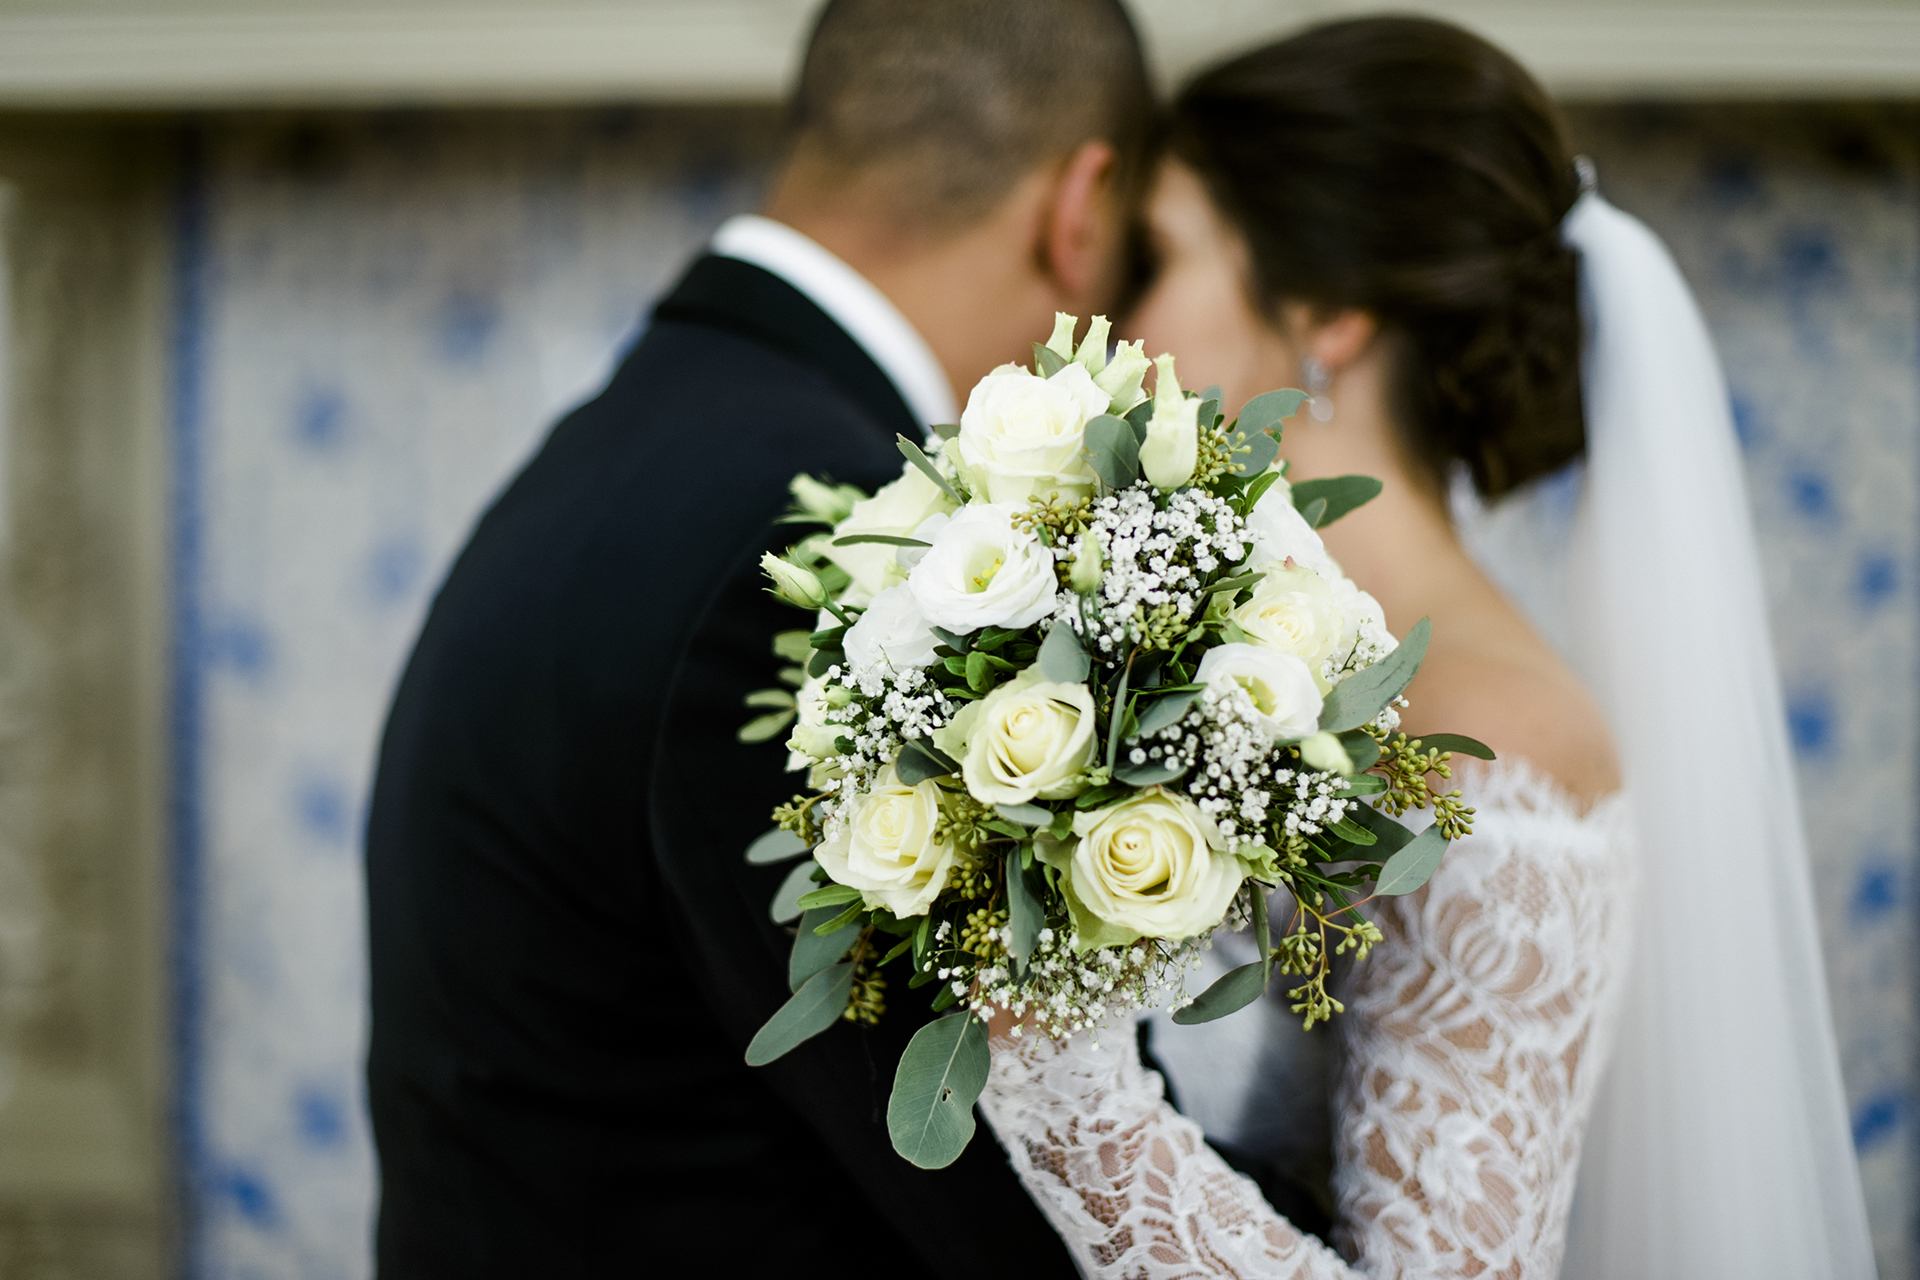 Hochzeitsreportage_J&D_048_Caroline Queda Fotografie